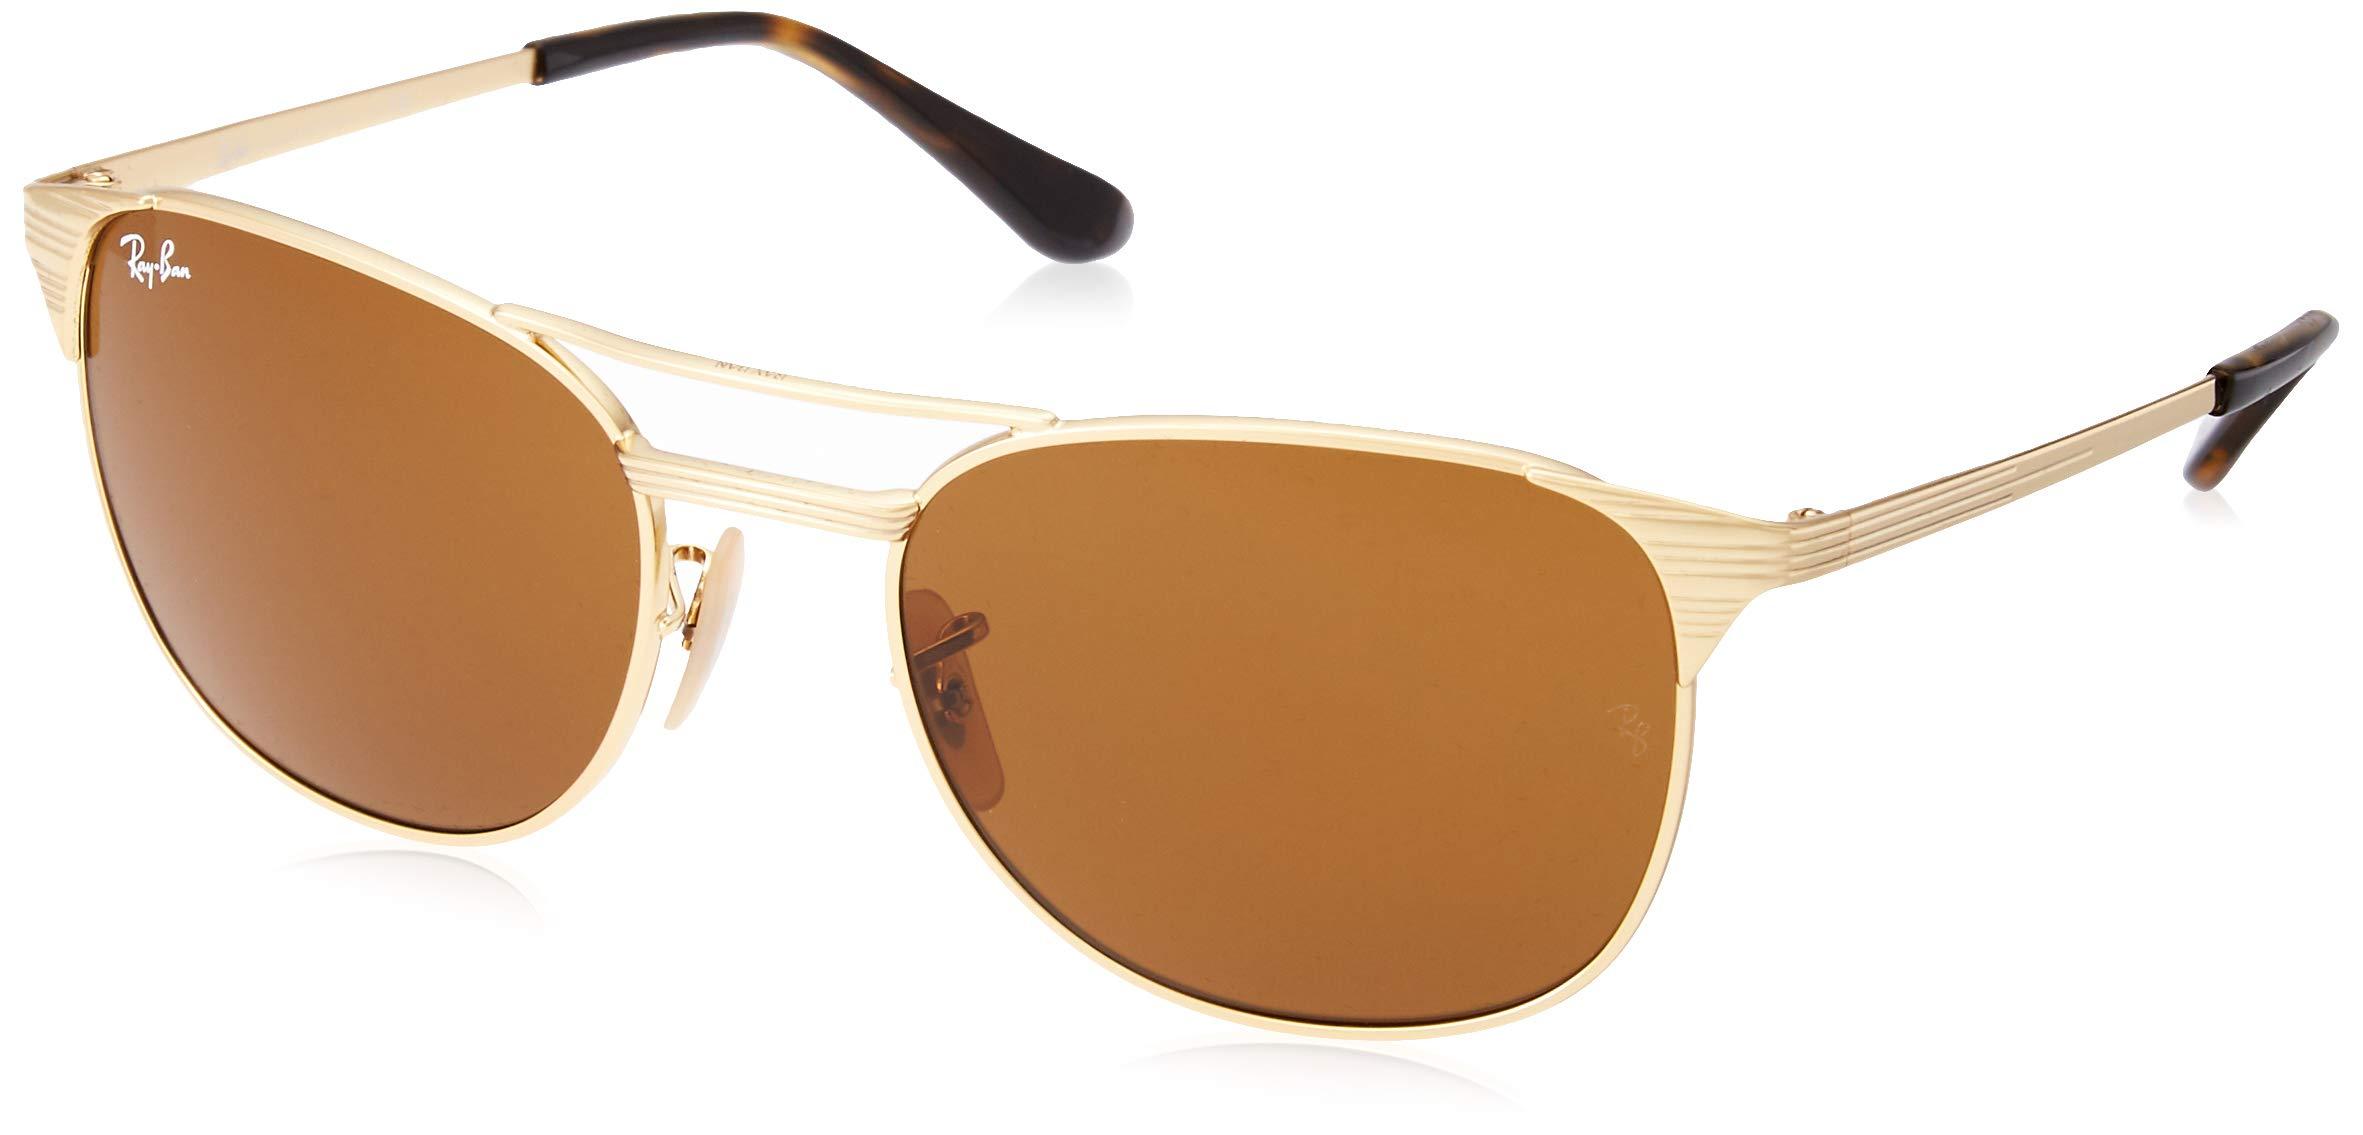 Ray-Ban Men's Metal Man Square Sunglasses, Gold/Brown, 55 mm